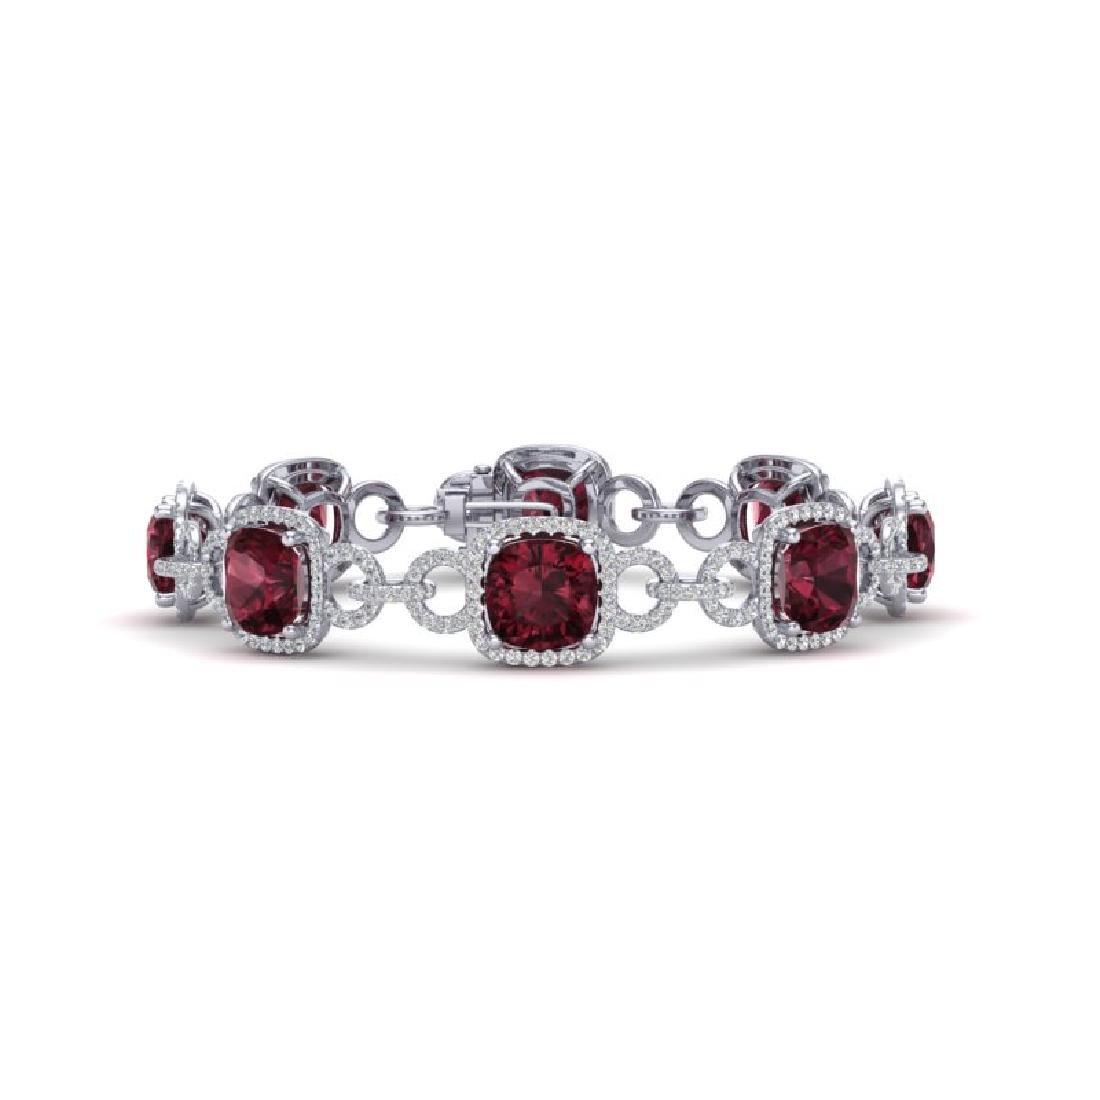 30 CTW Garnet & VS/SI Diamond Bracelet 14K White Gold